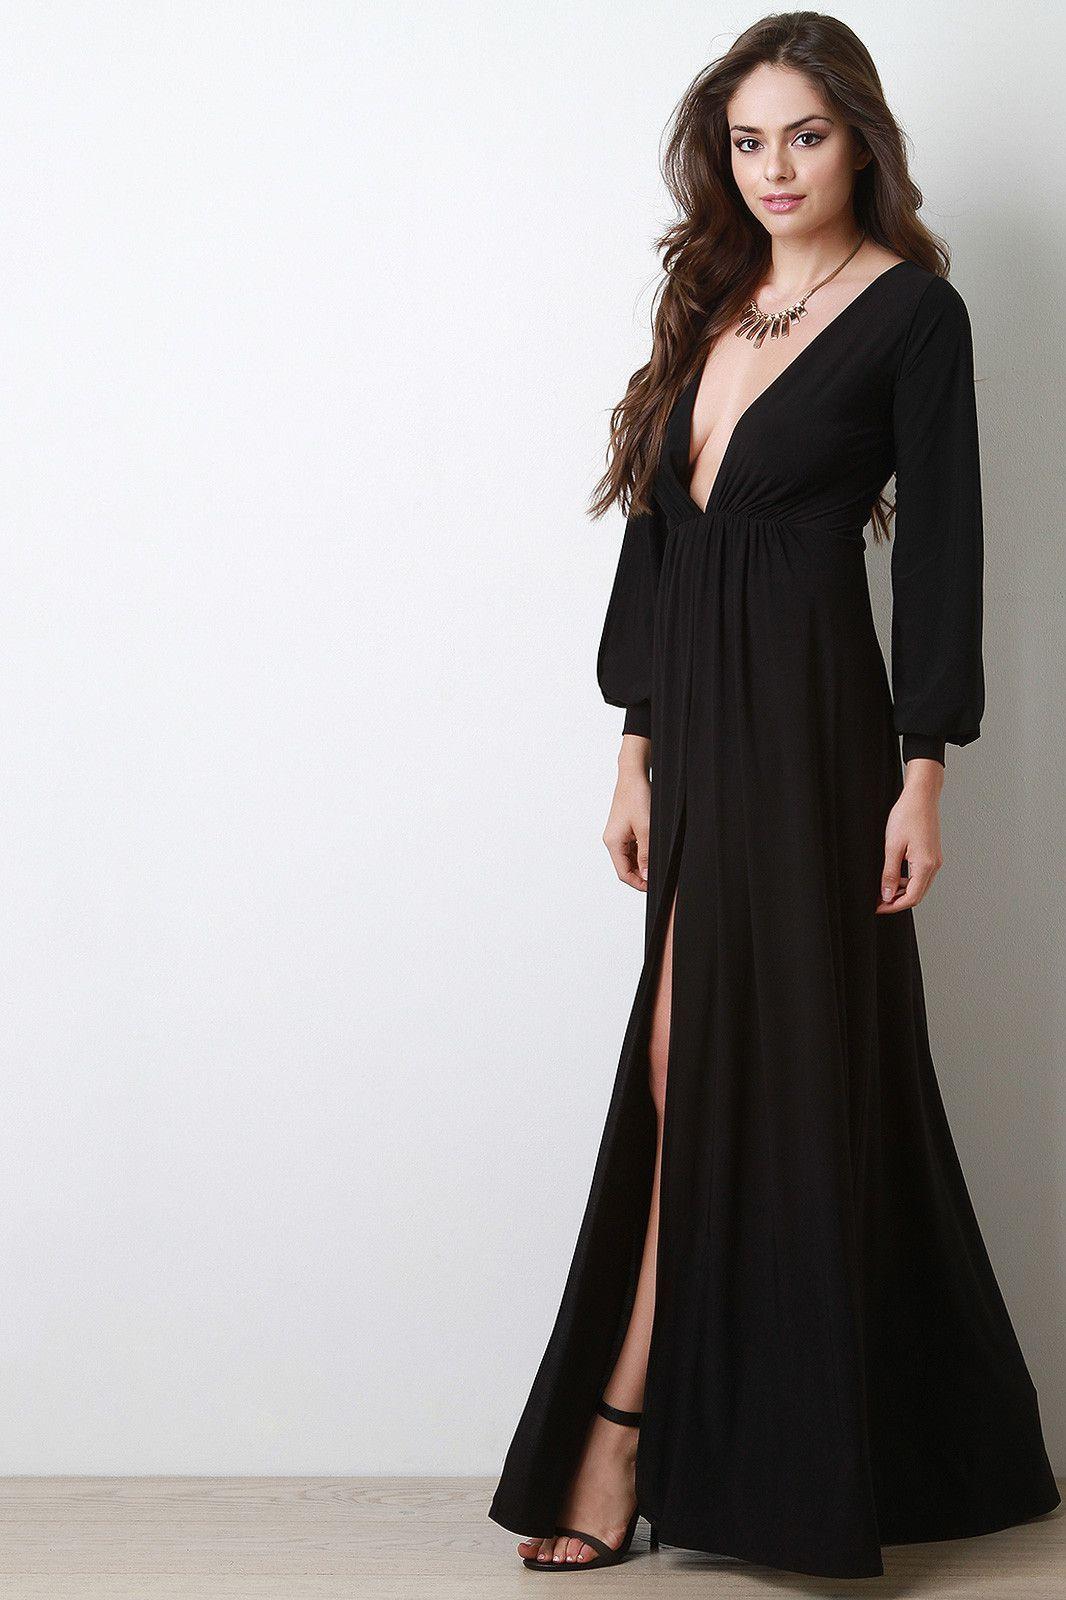 Deep v neck thigh high slit maxi dress maxis v necks and thigh highs